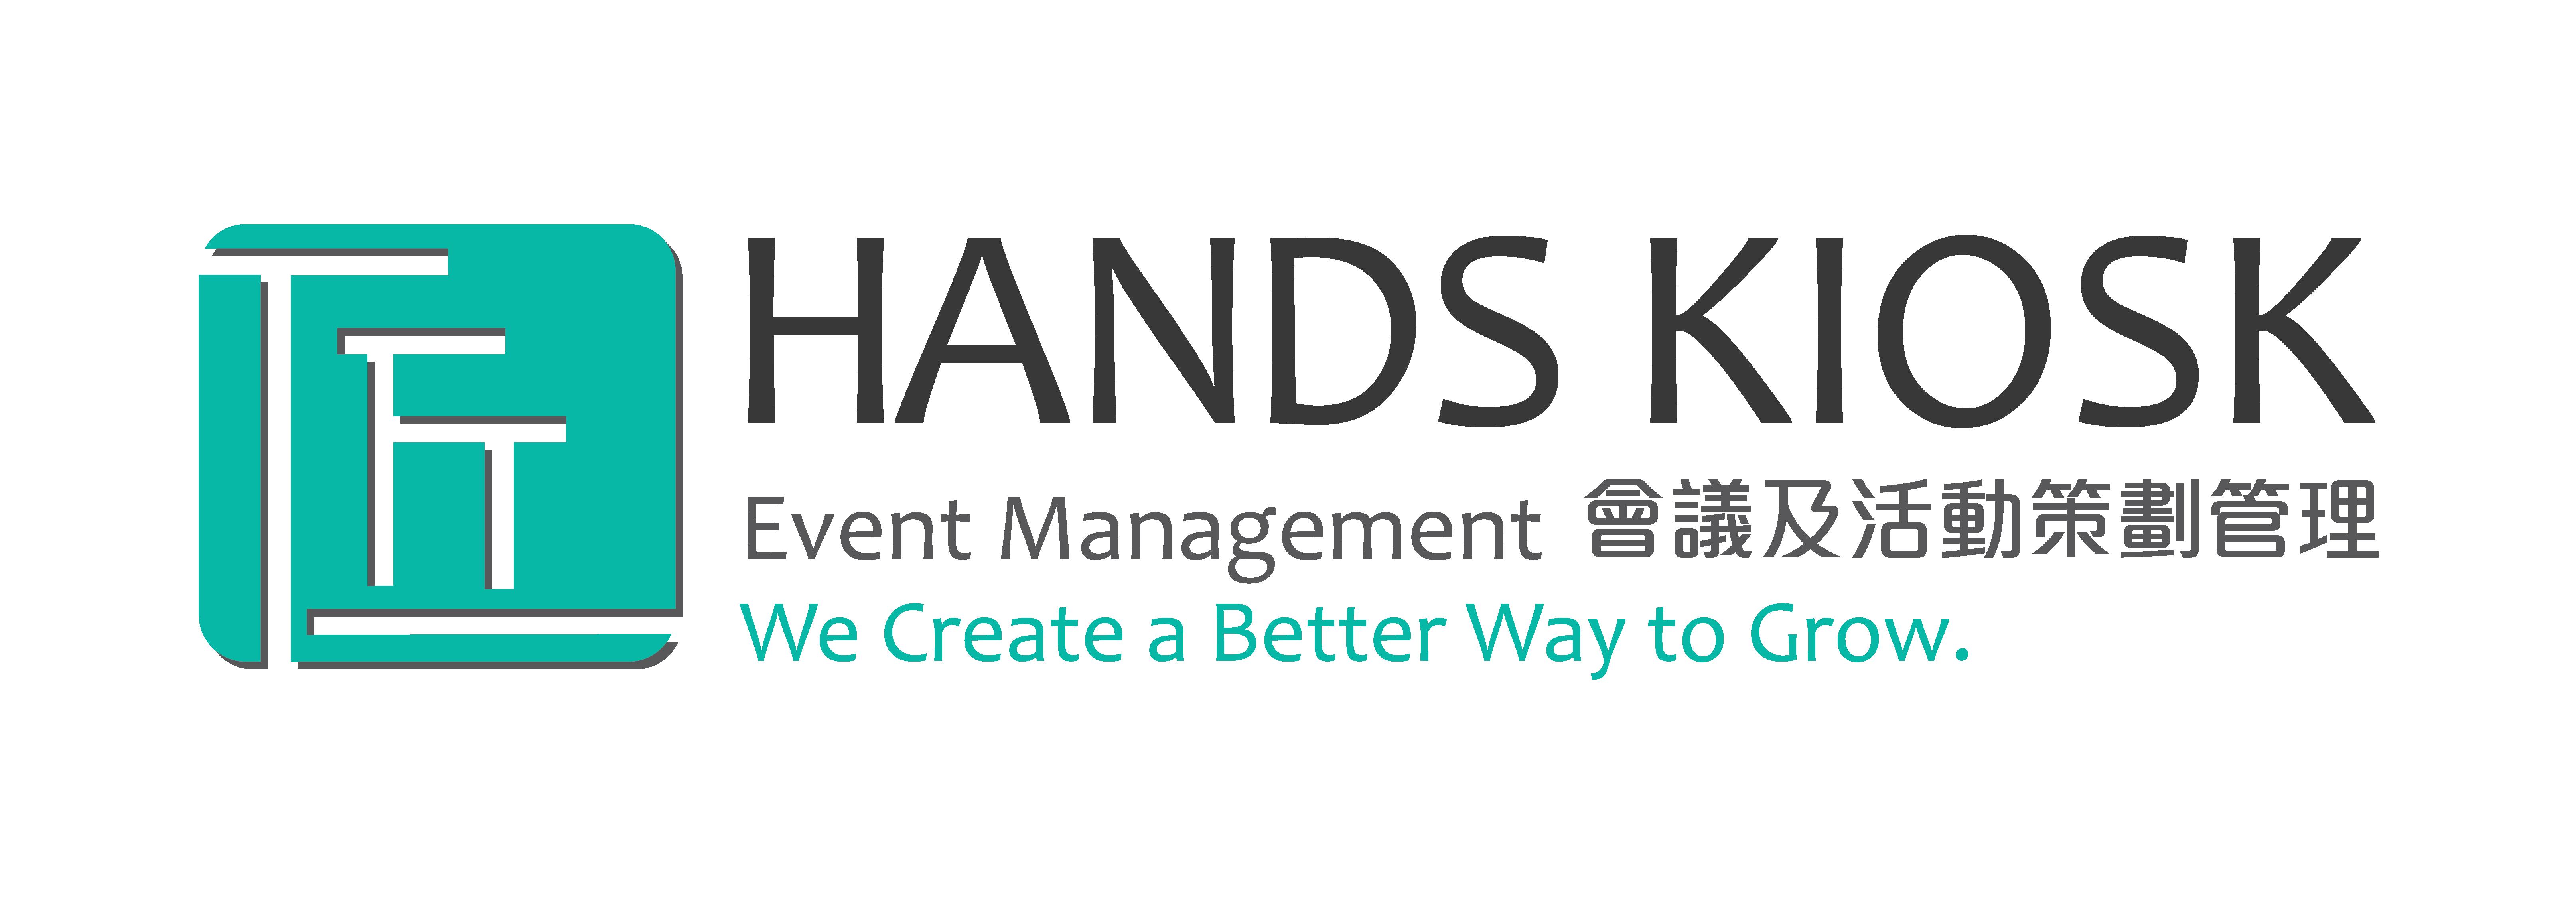 Hands Kiosk | Event Management